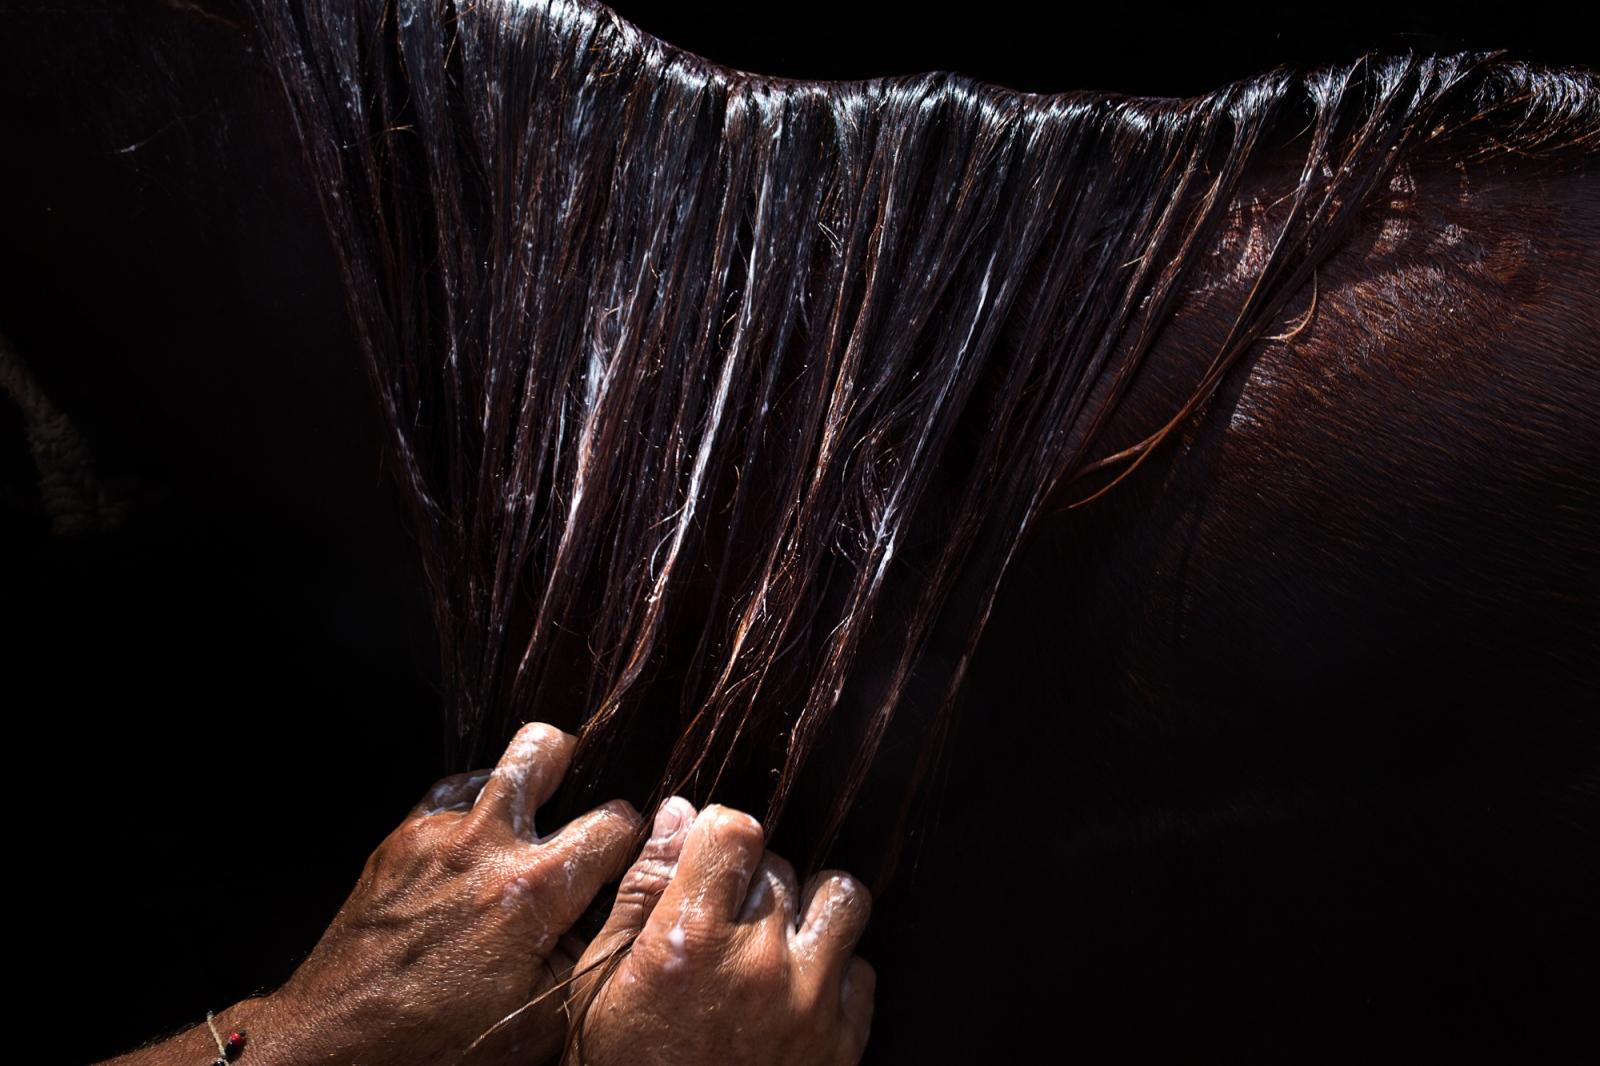 Art and Documentary Photography - Loading 001_Venezuela_WilRiera_Candidate.jpg